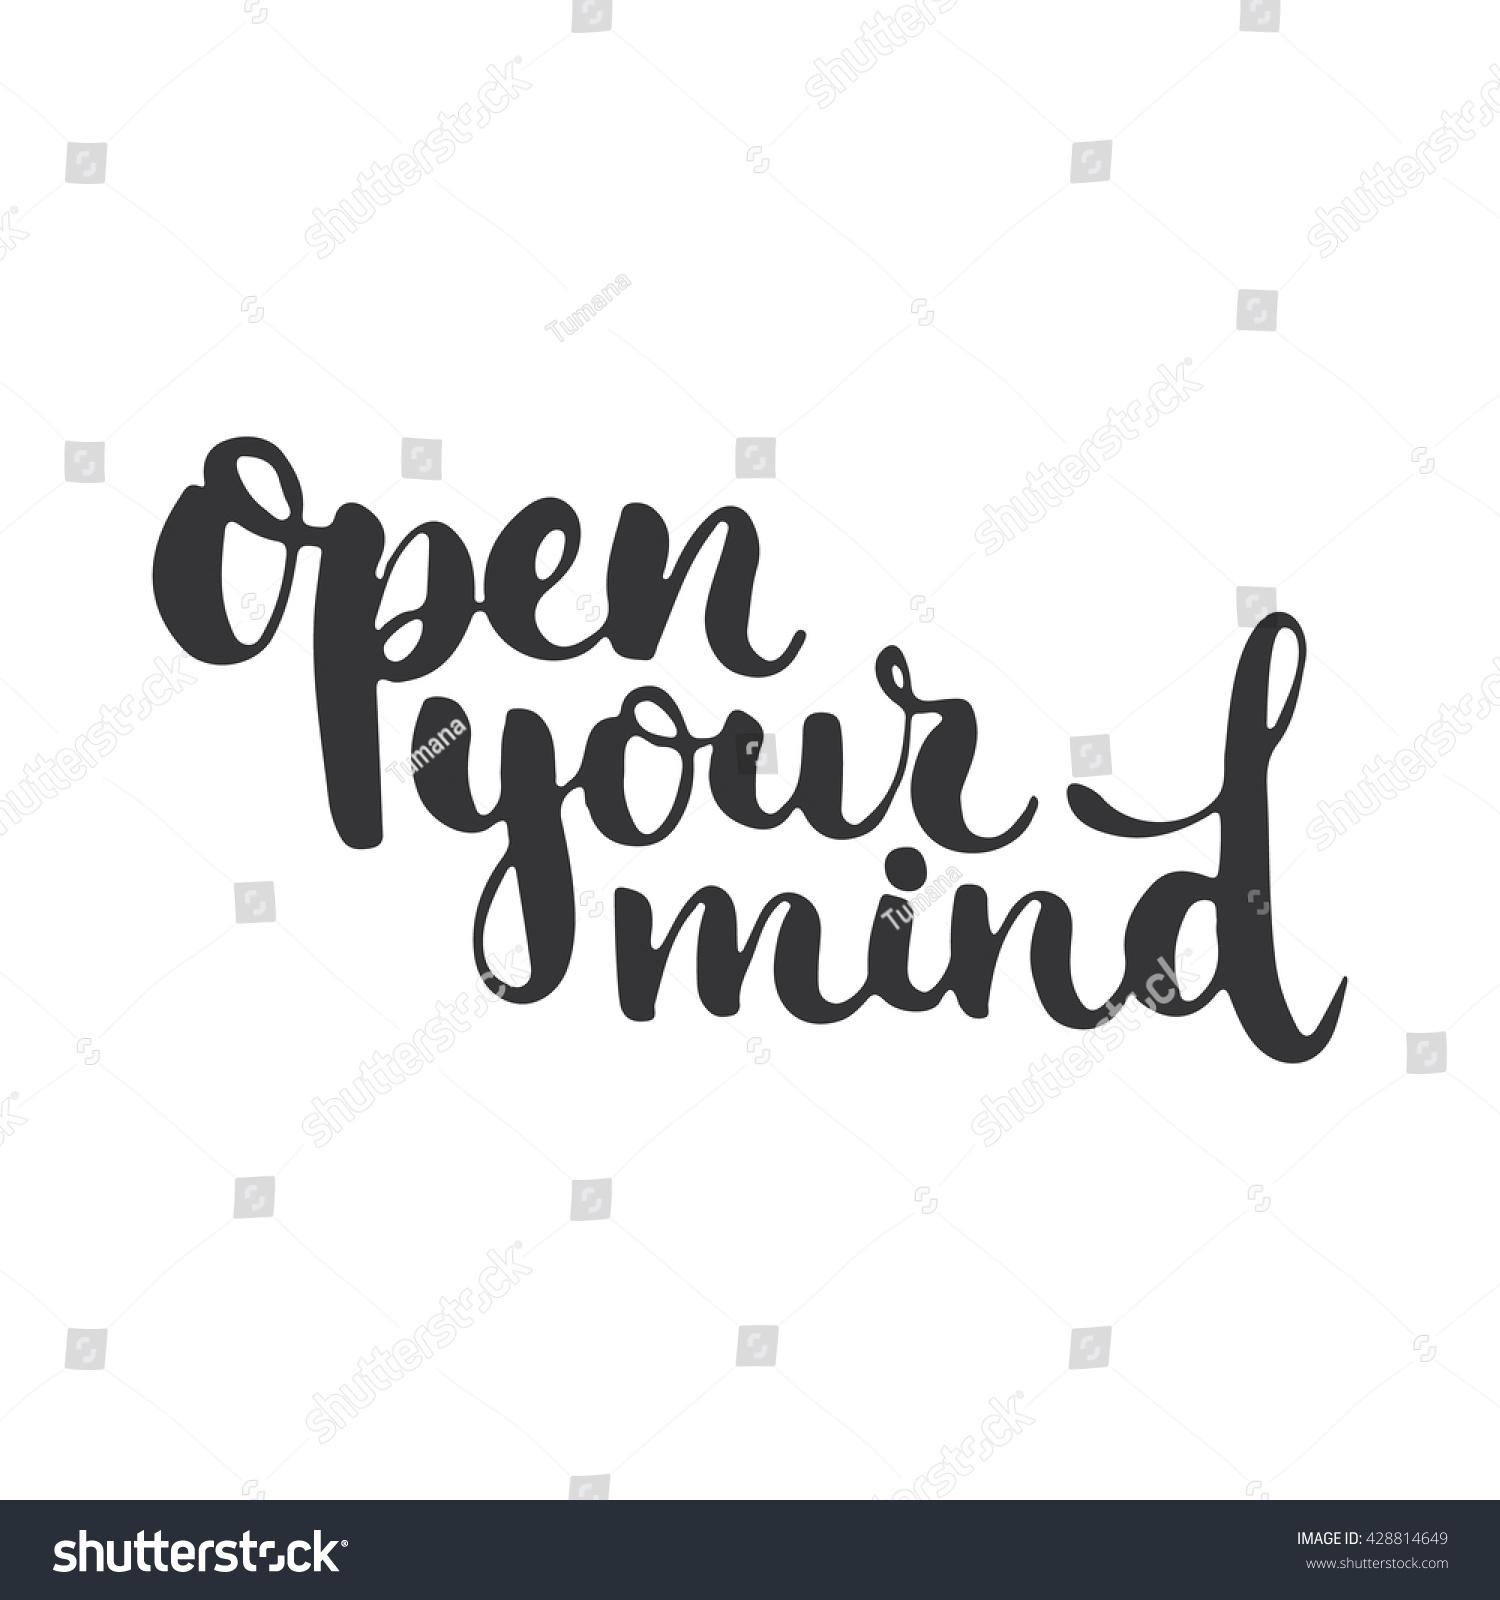 open your mind hand drawn lettering stock vector 428814649 shutterstock. Black Bedroom Furniture Sets. Home Design Ideas